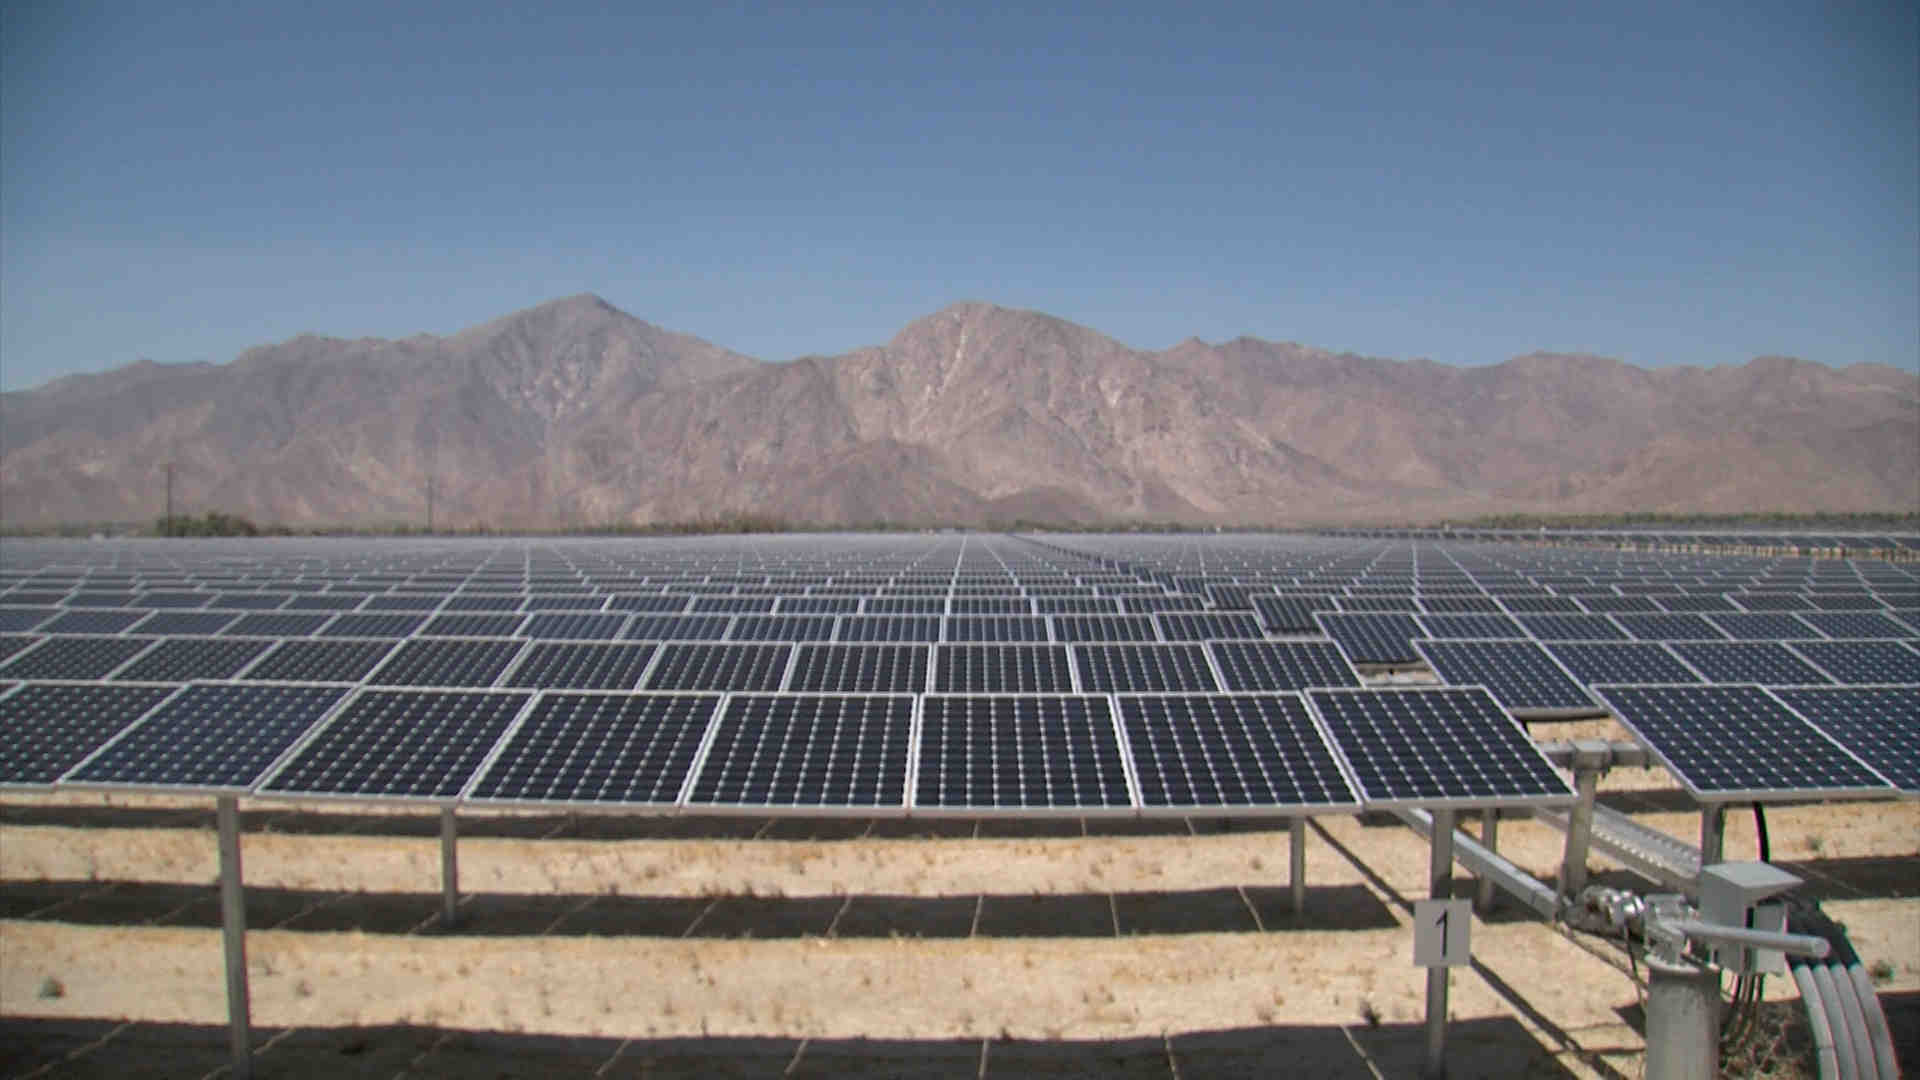 What will a 100-watt solar panel run?